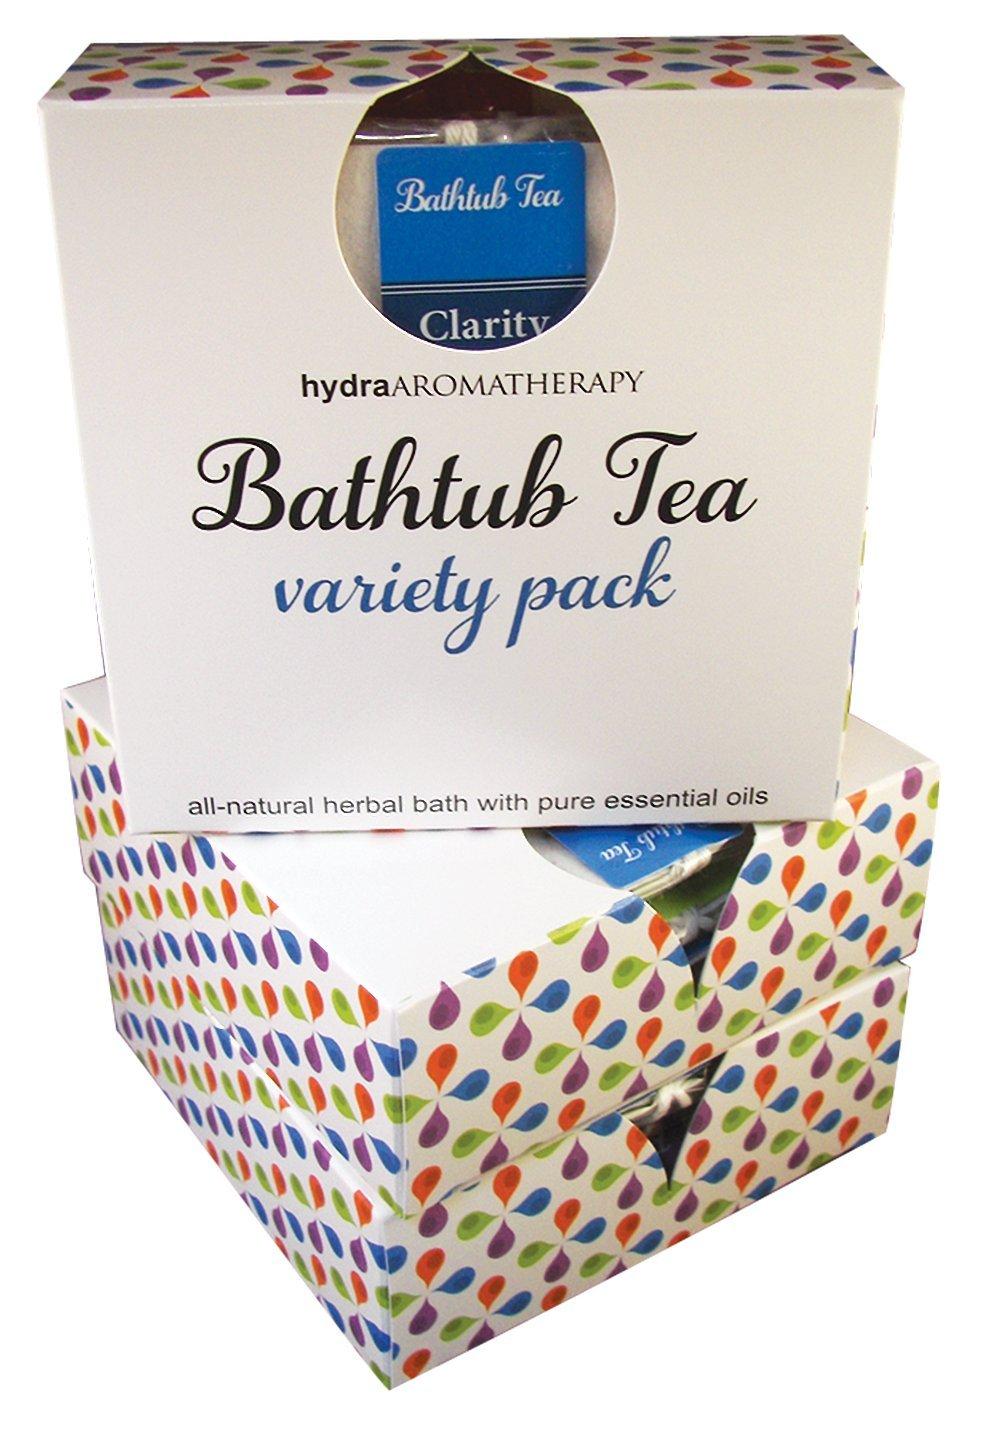 hydraAromatherapy Signature Bathtub Tea Variety Pack by hydraAromatherapy